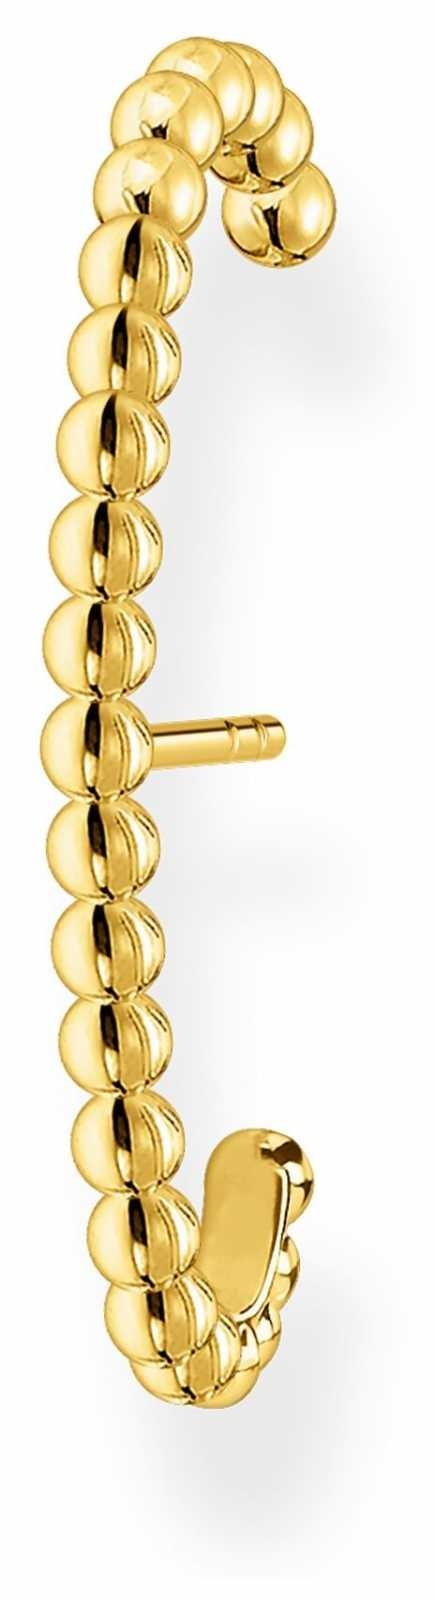 Thomas Sabo 18k Yellow Gold Plated Single Ear Cuff H2154-413-39